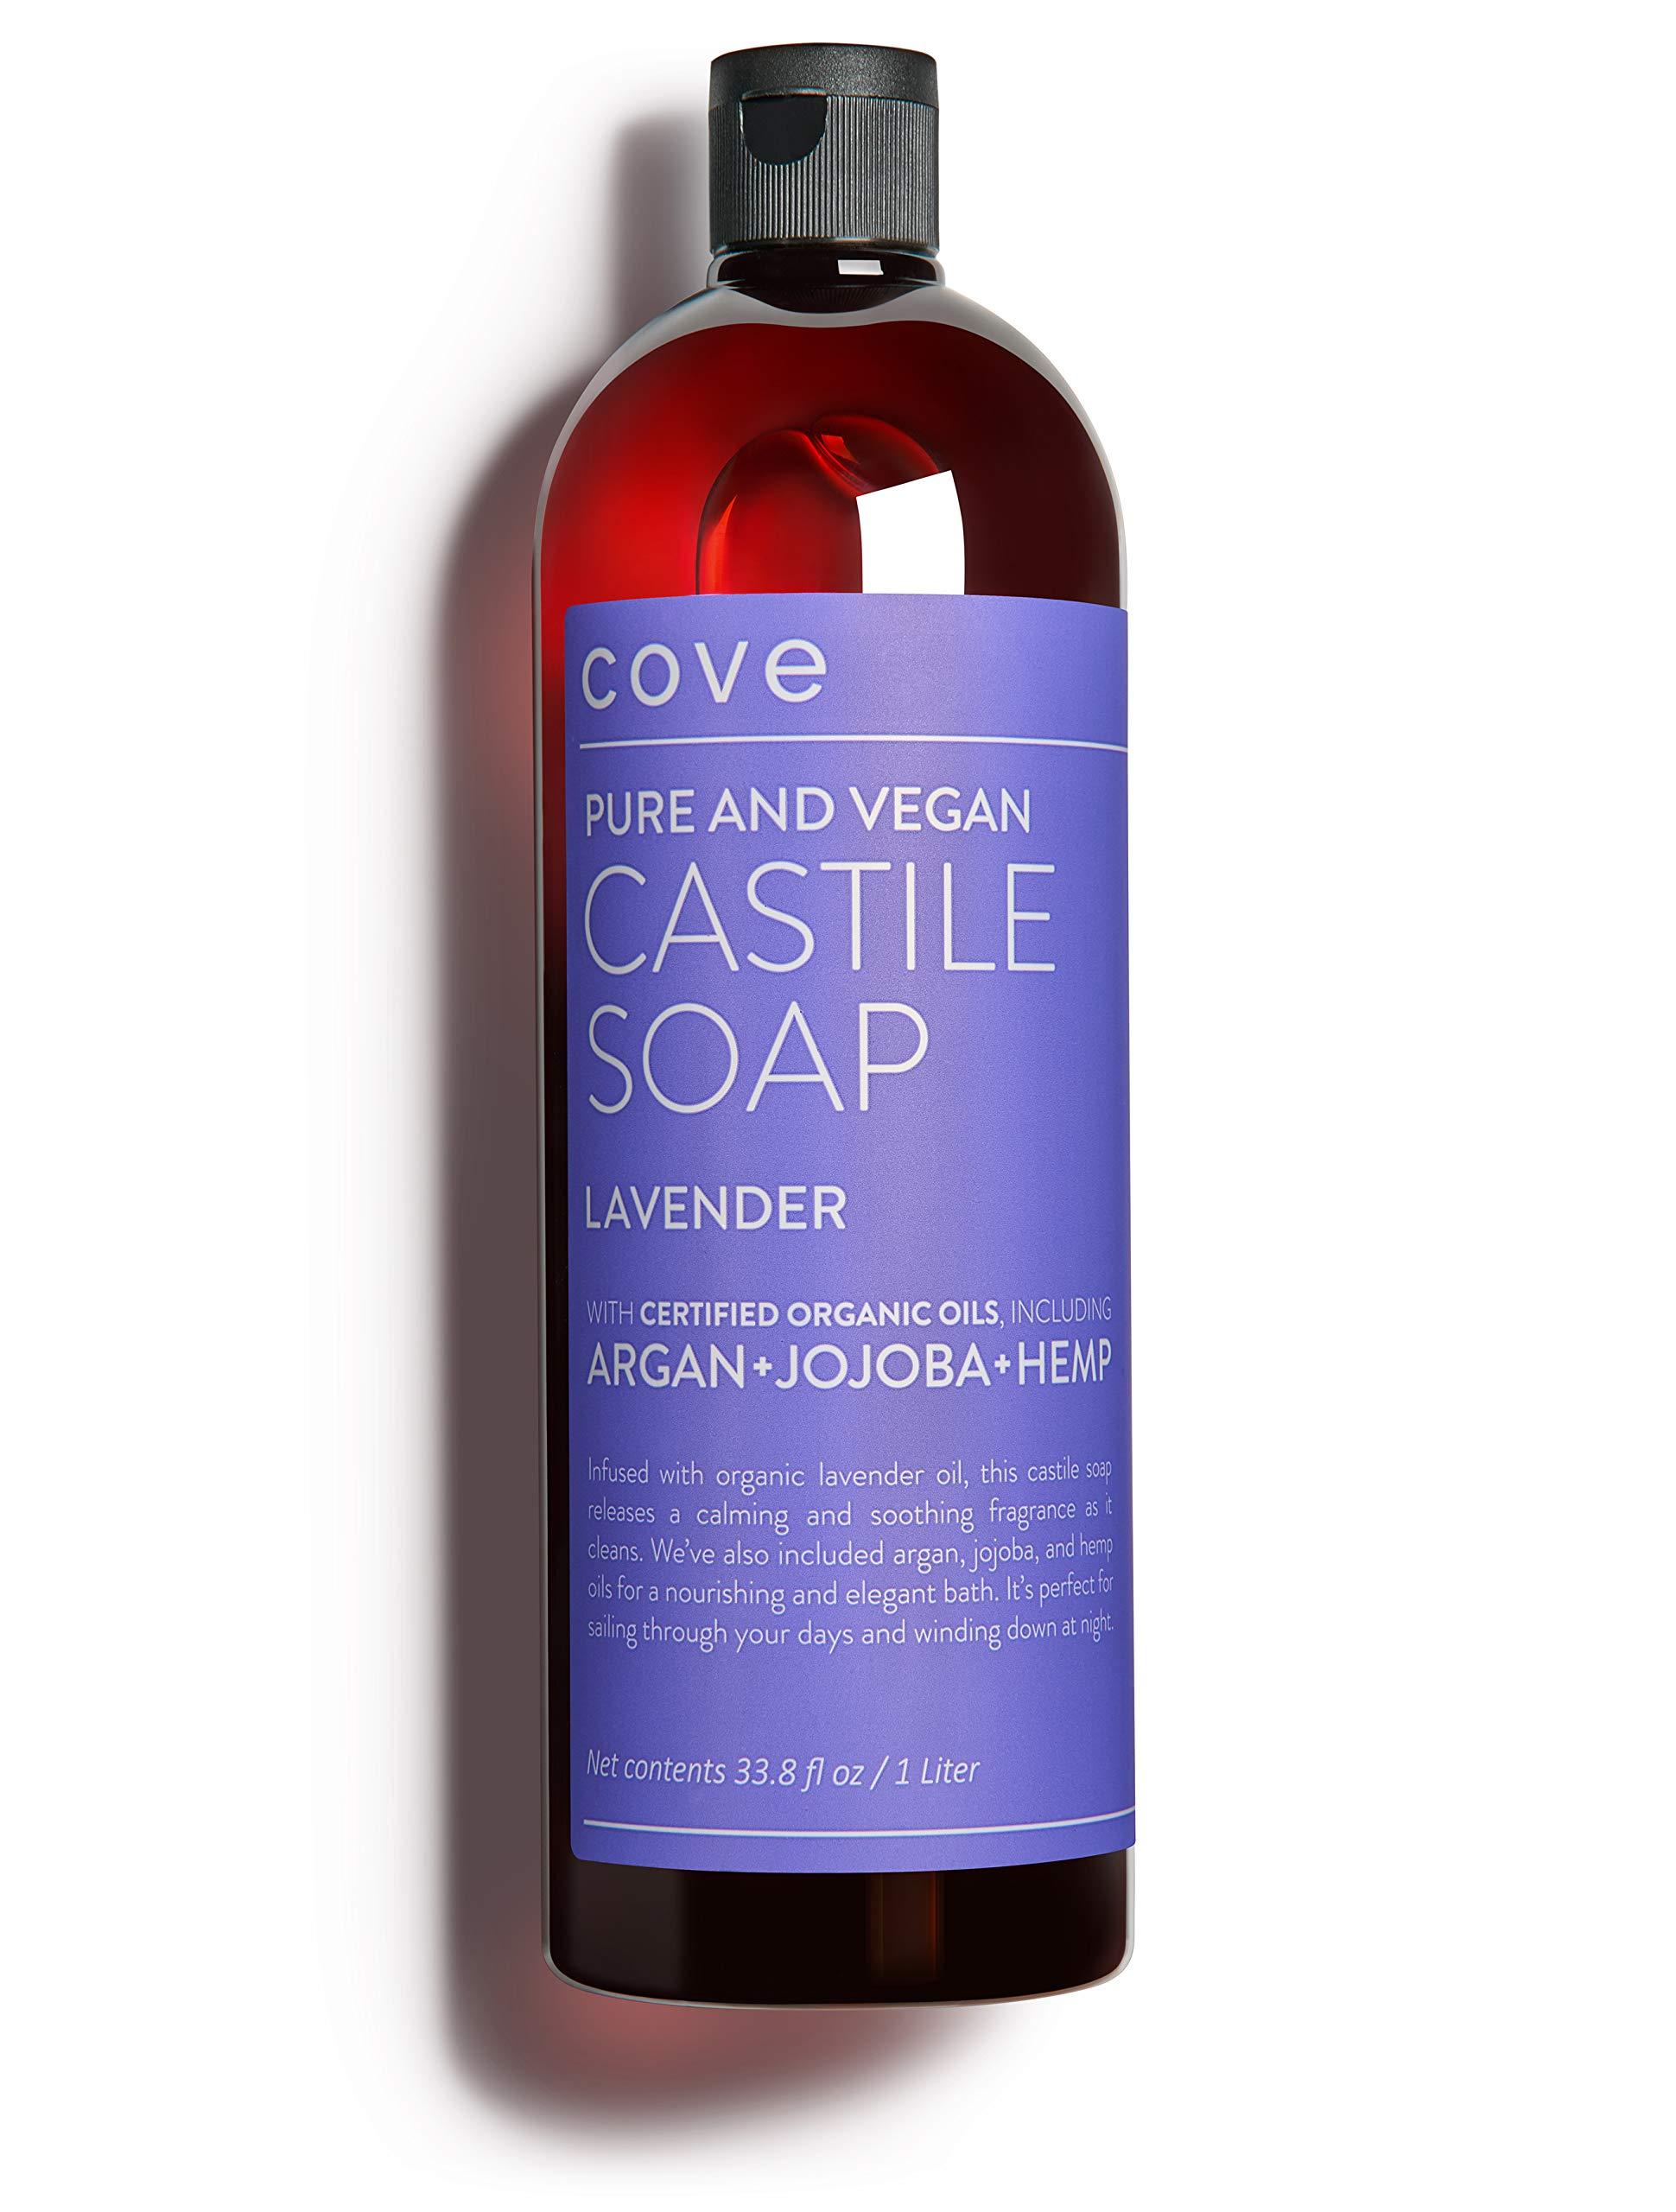 Cove Castile Soap Lavender - 33.8 oz / 1 Liter - Organic Argan, Hemp, Jojoba Oils